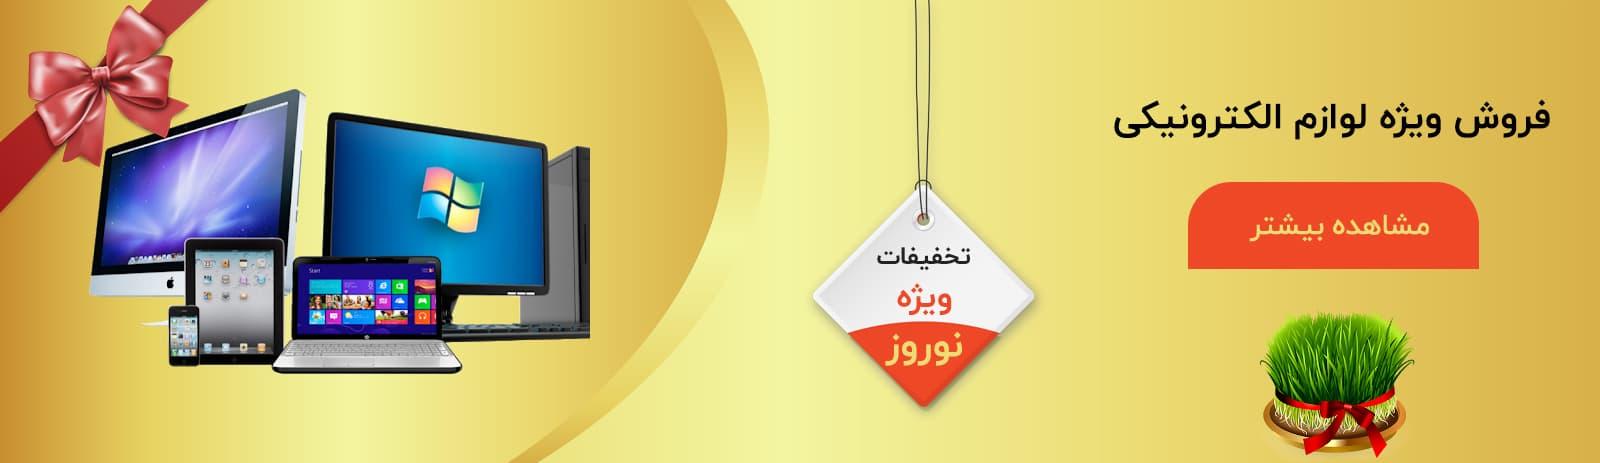 فروش ویژه لوازم الکترونیکی